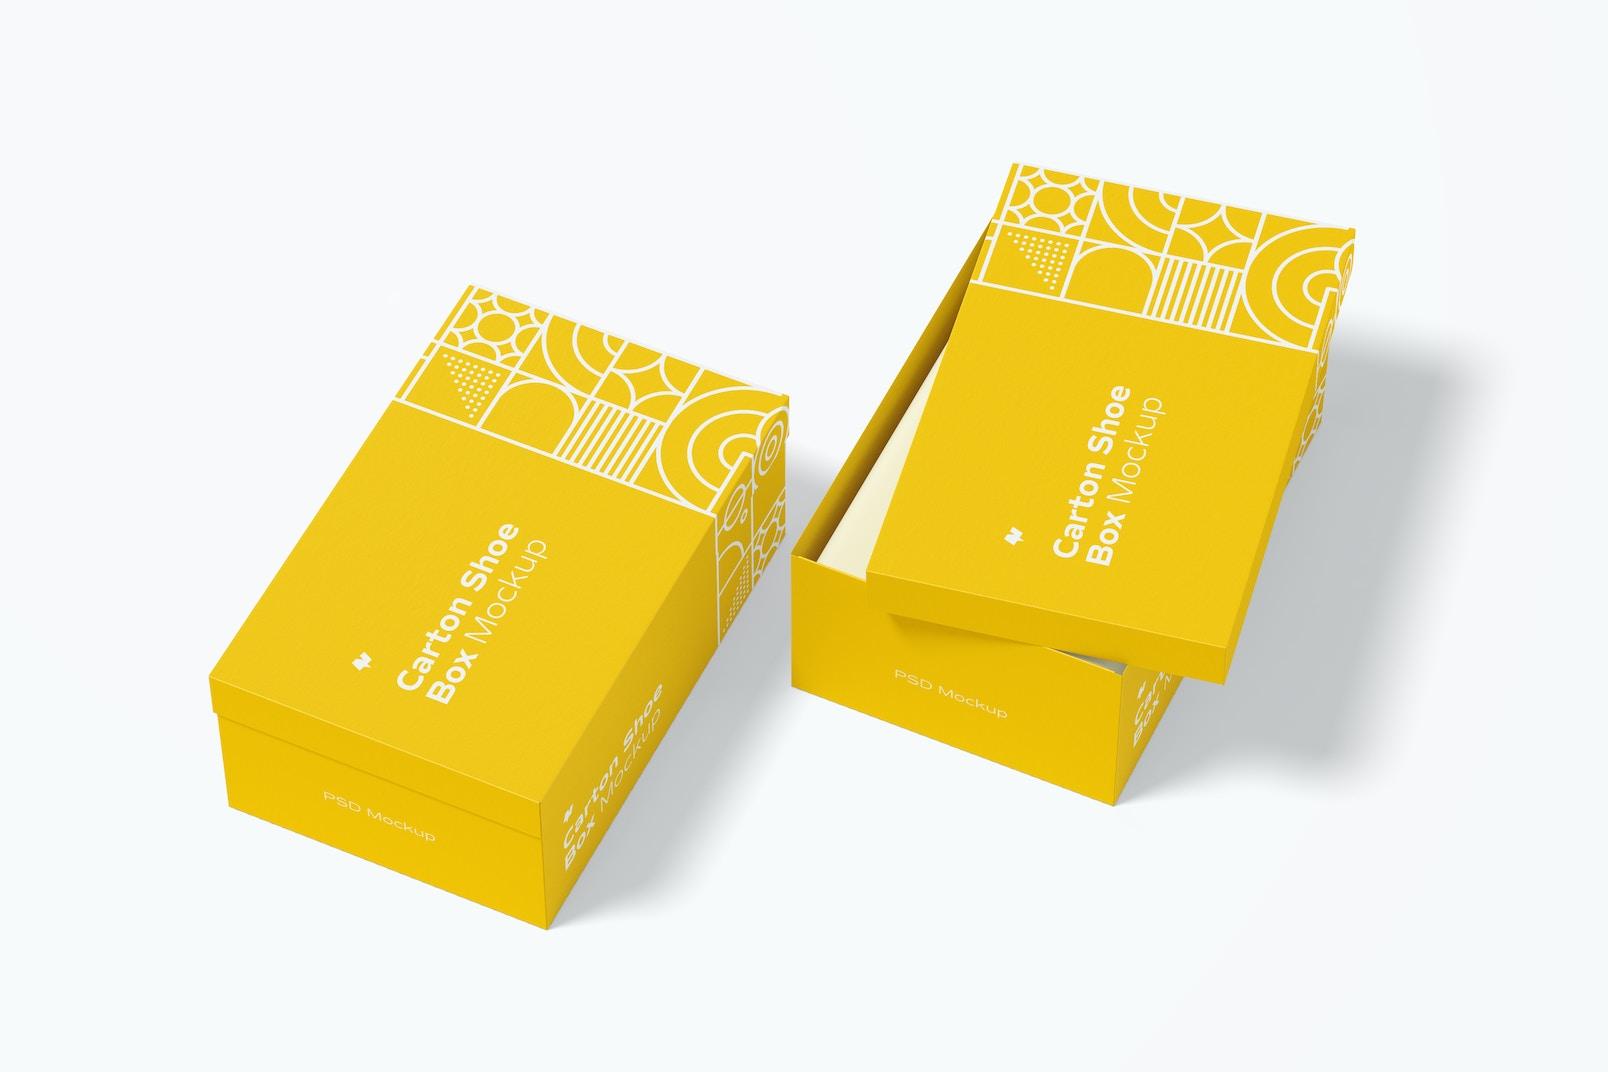 Carton Shoe Boxes Mockup, Perspective